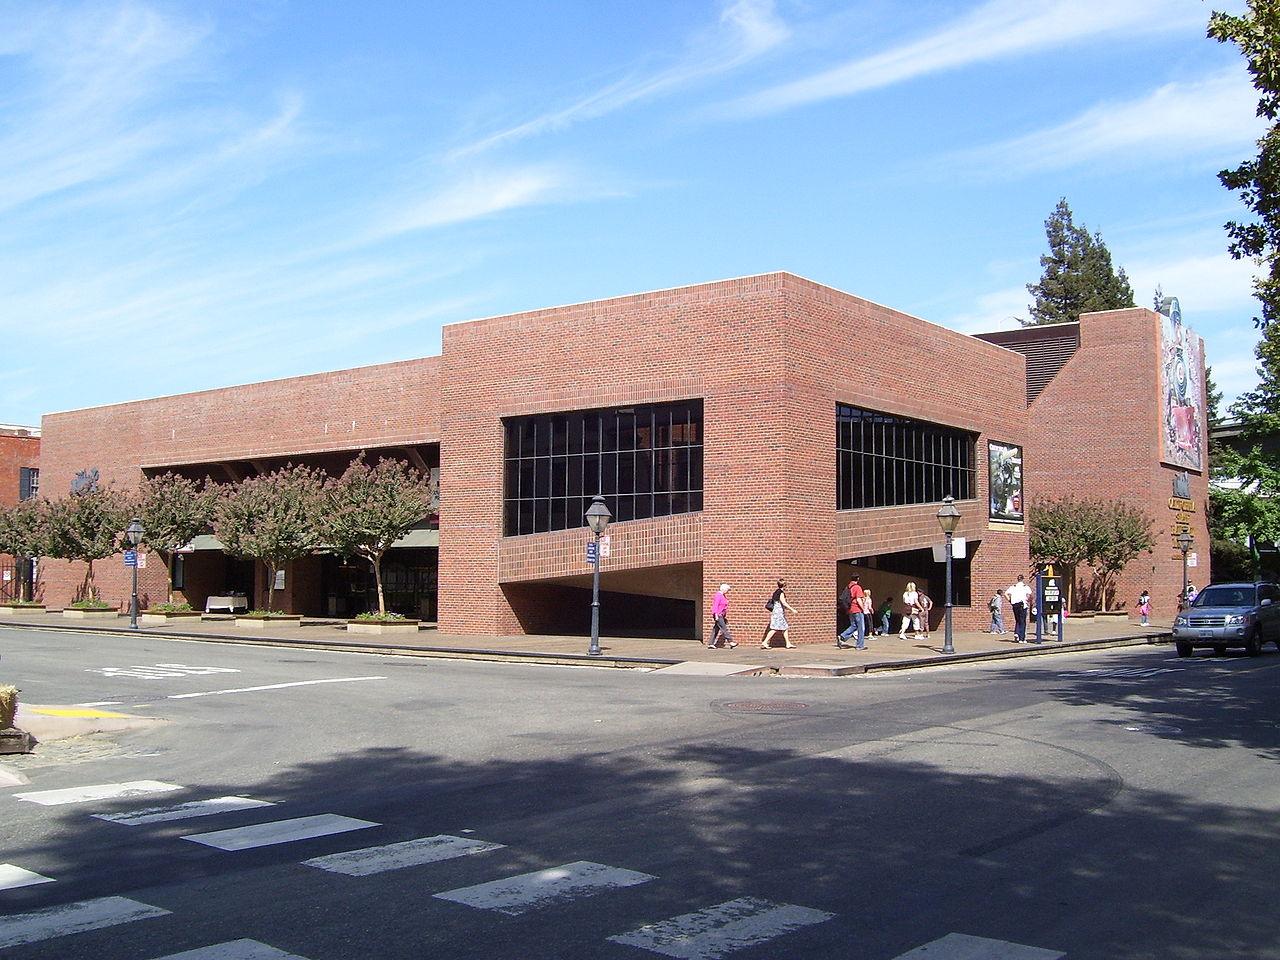 Top Museum In Sacramento-California State Railroad Museum